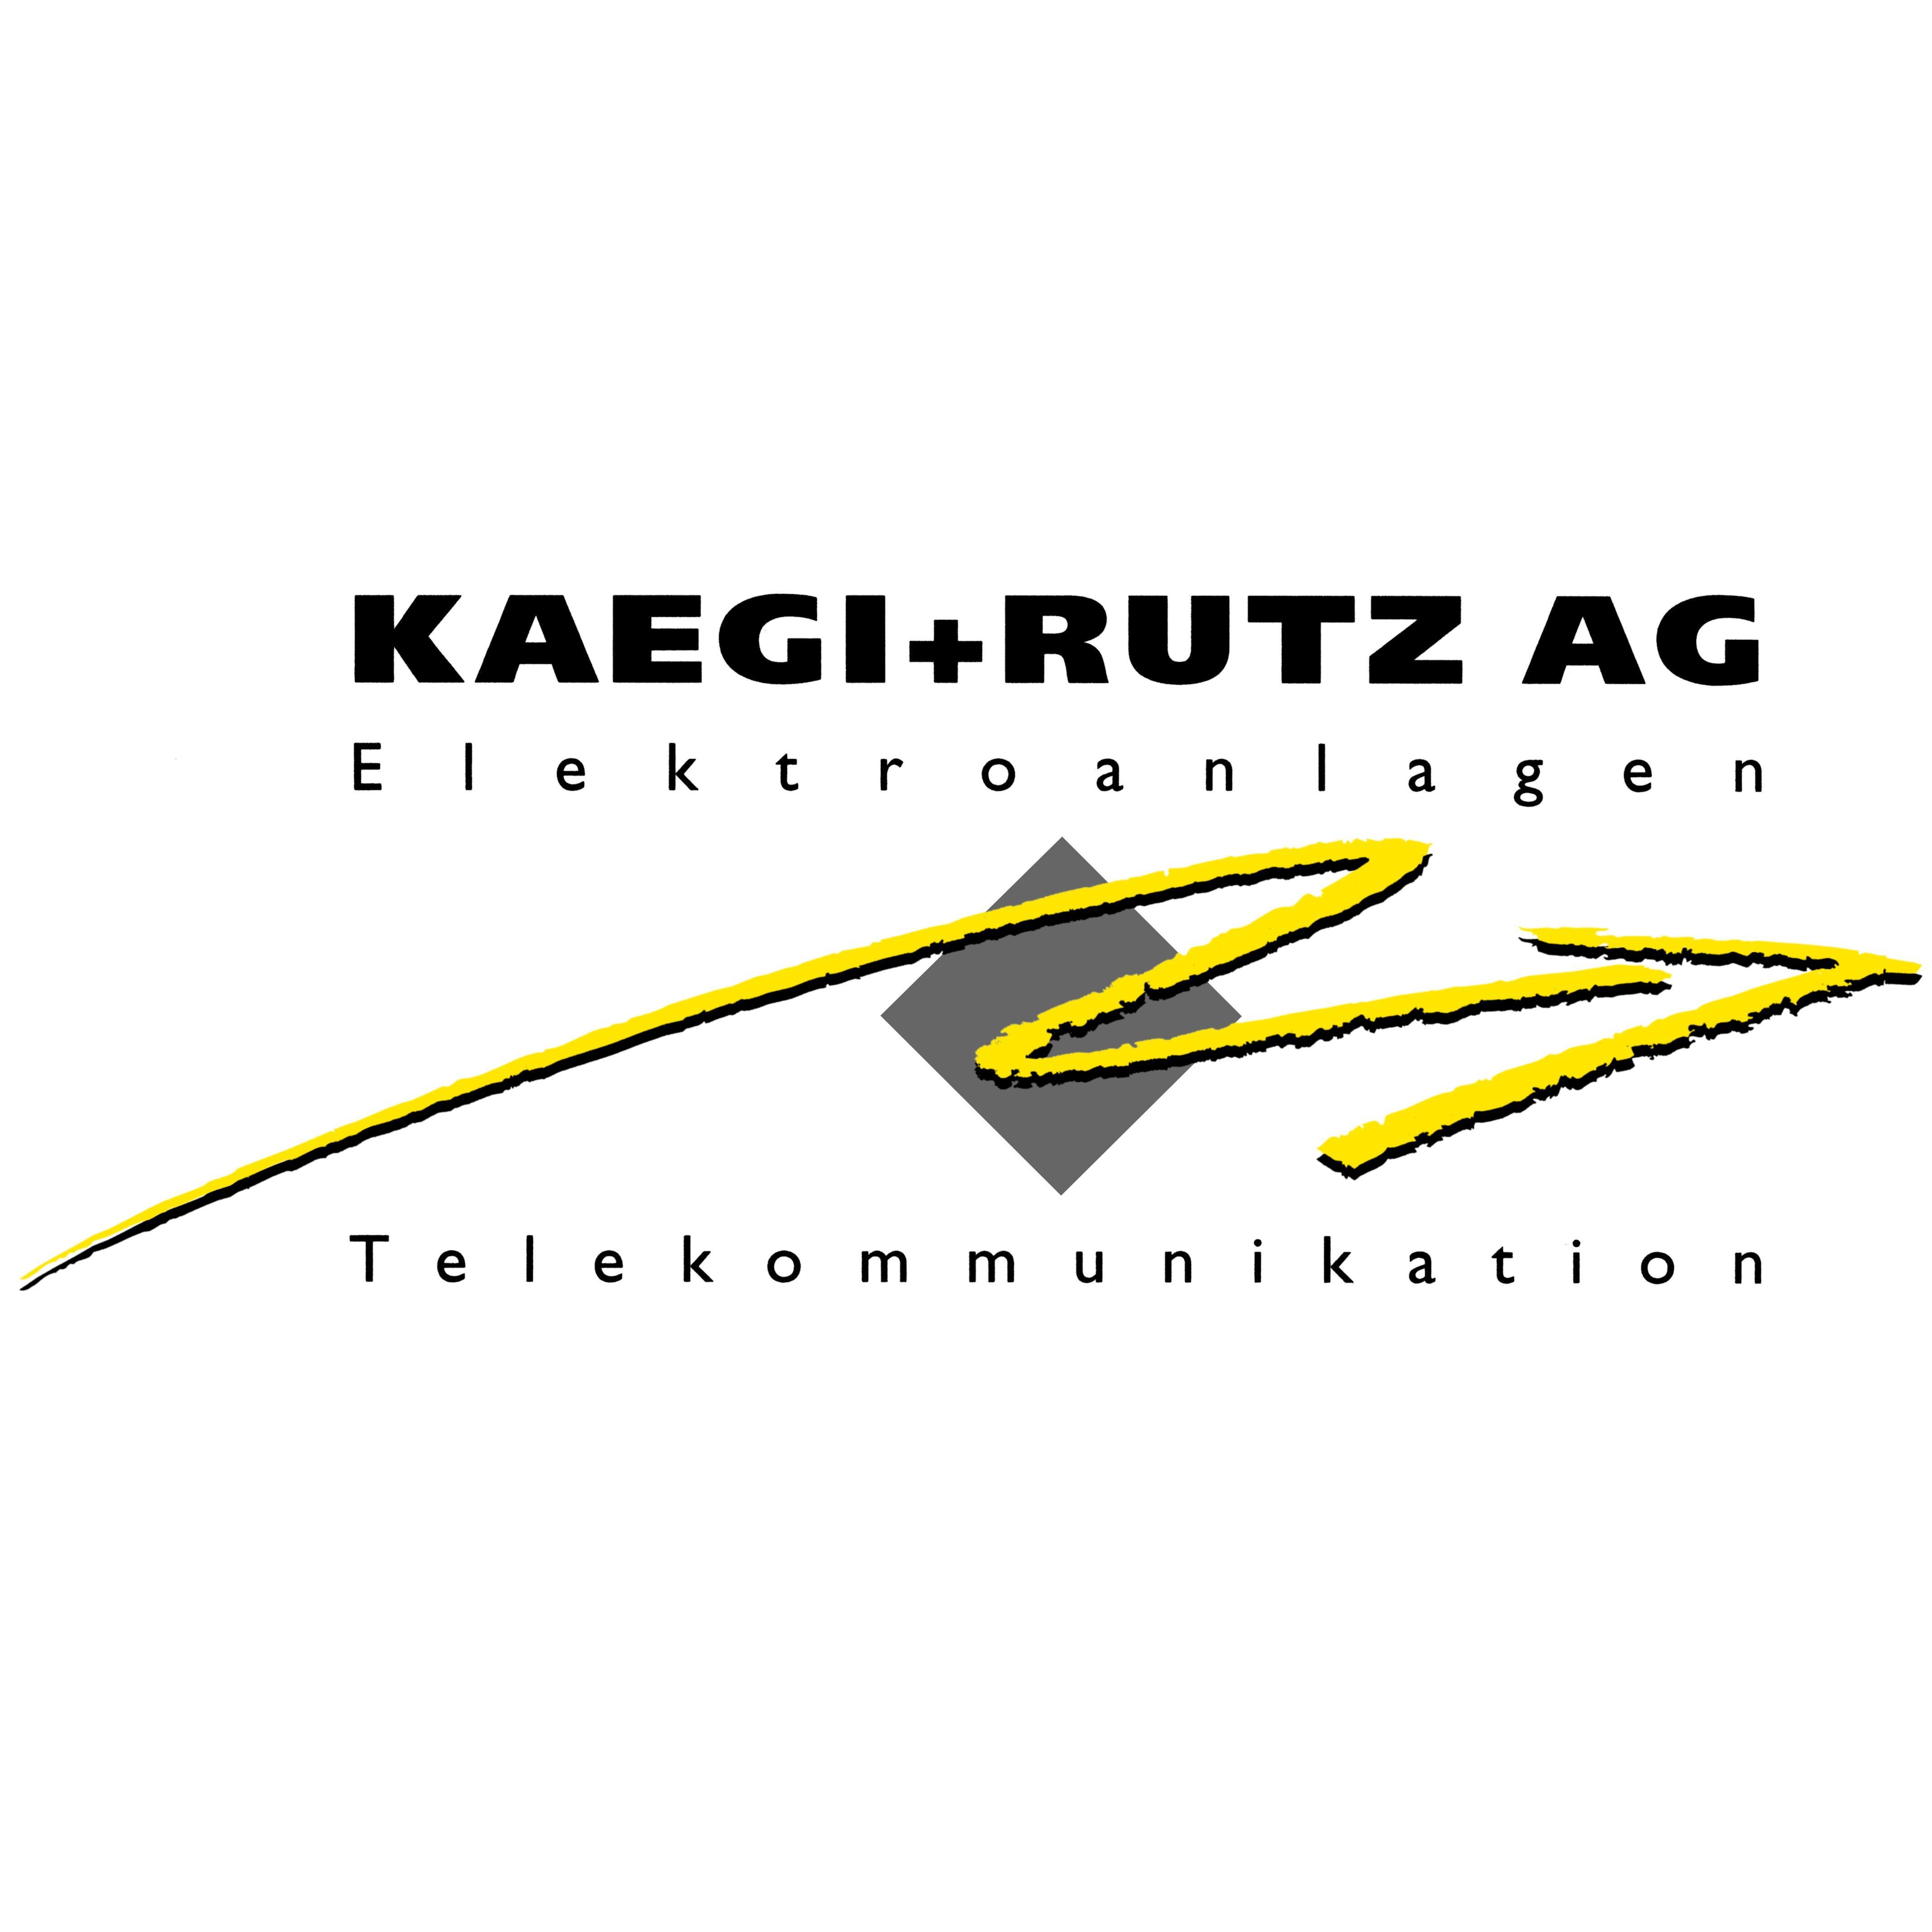 Kaegi & Rutz AG